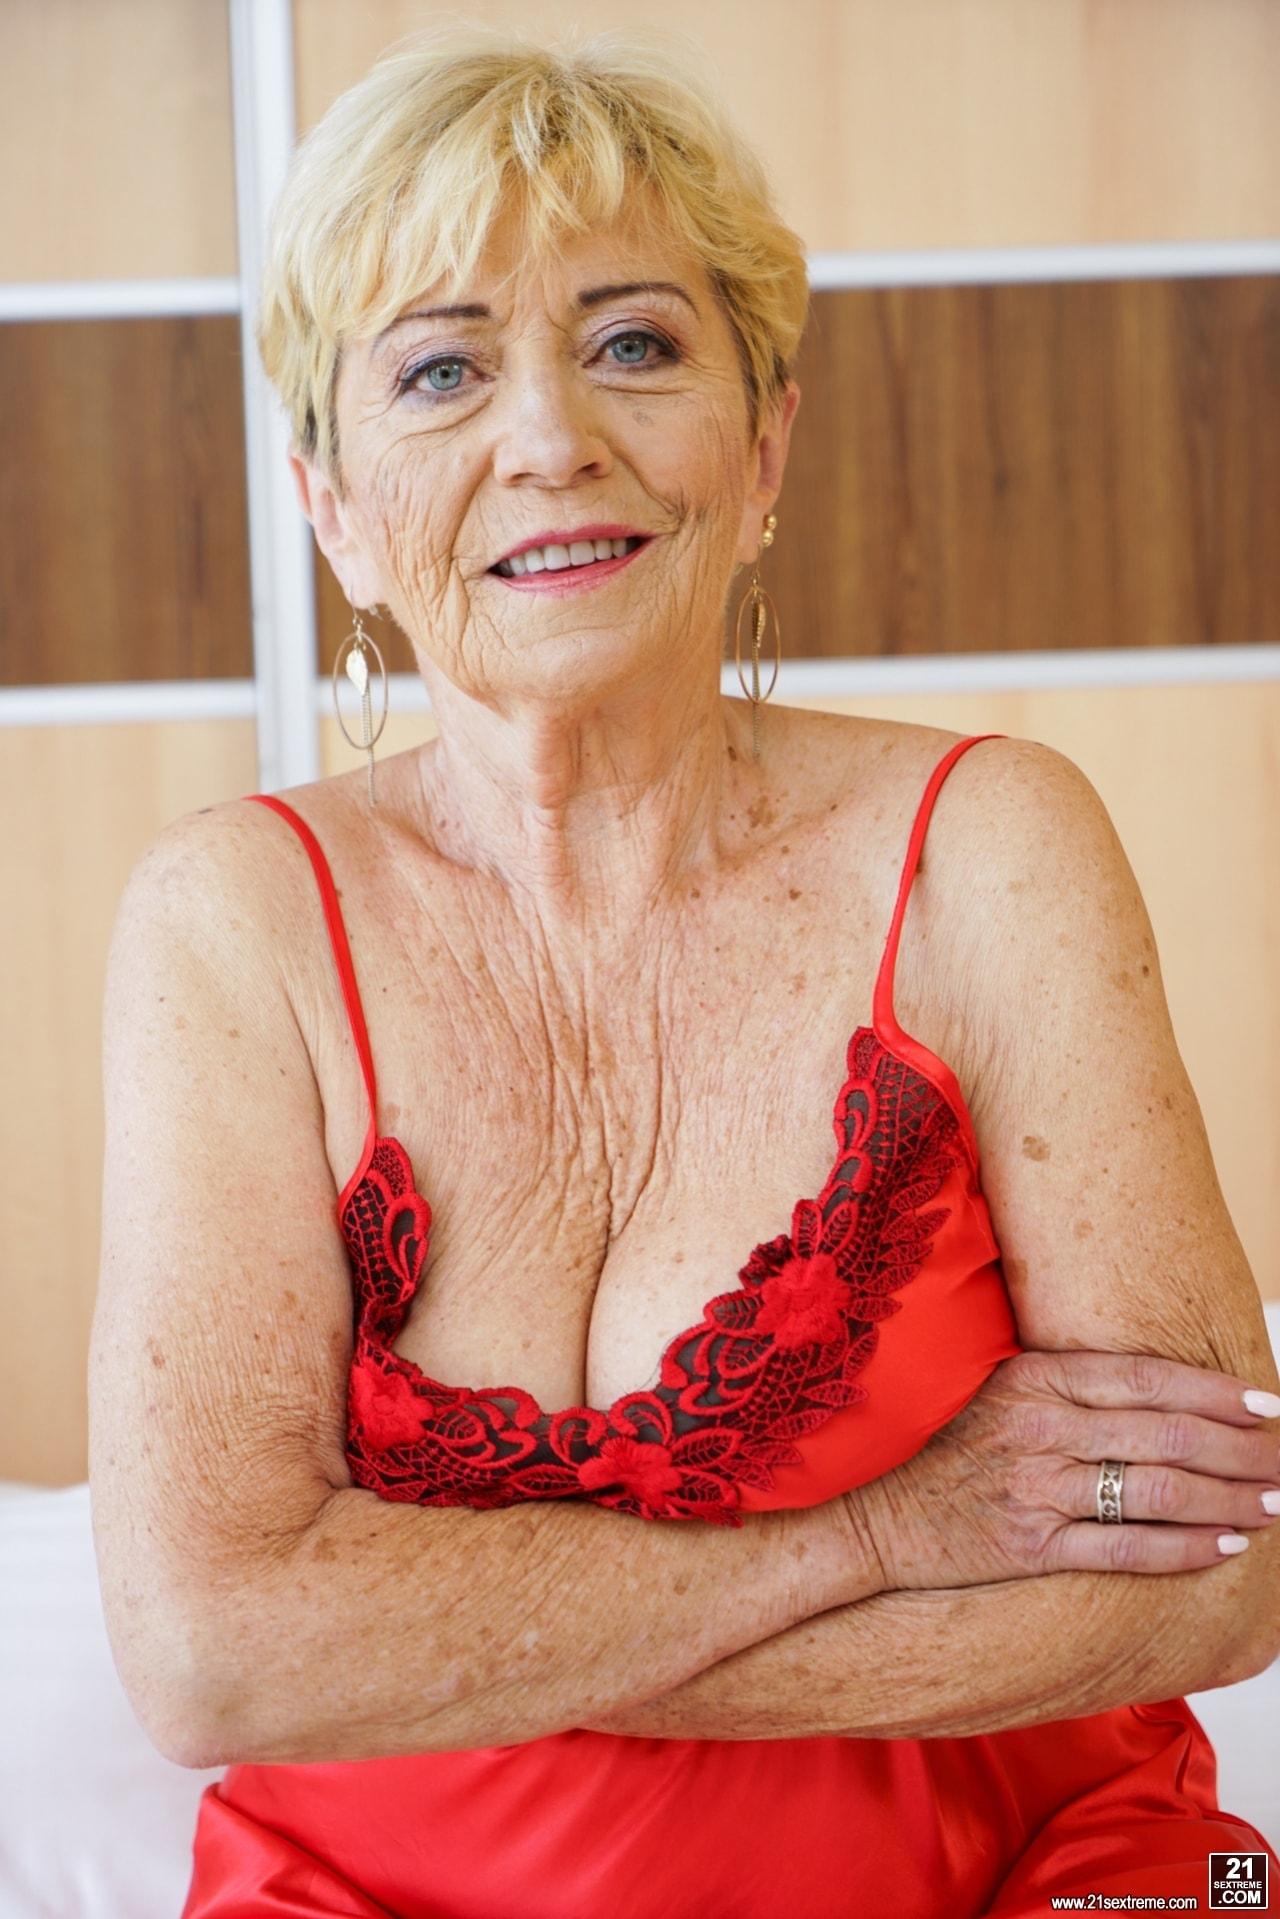 21Sextury 'Old Passion' starring Malya (Photo 1)